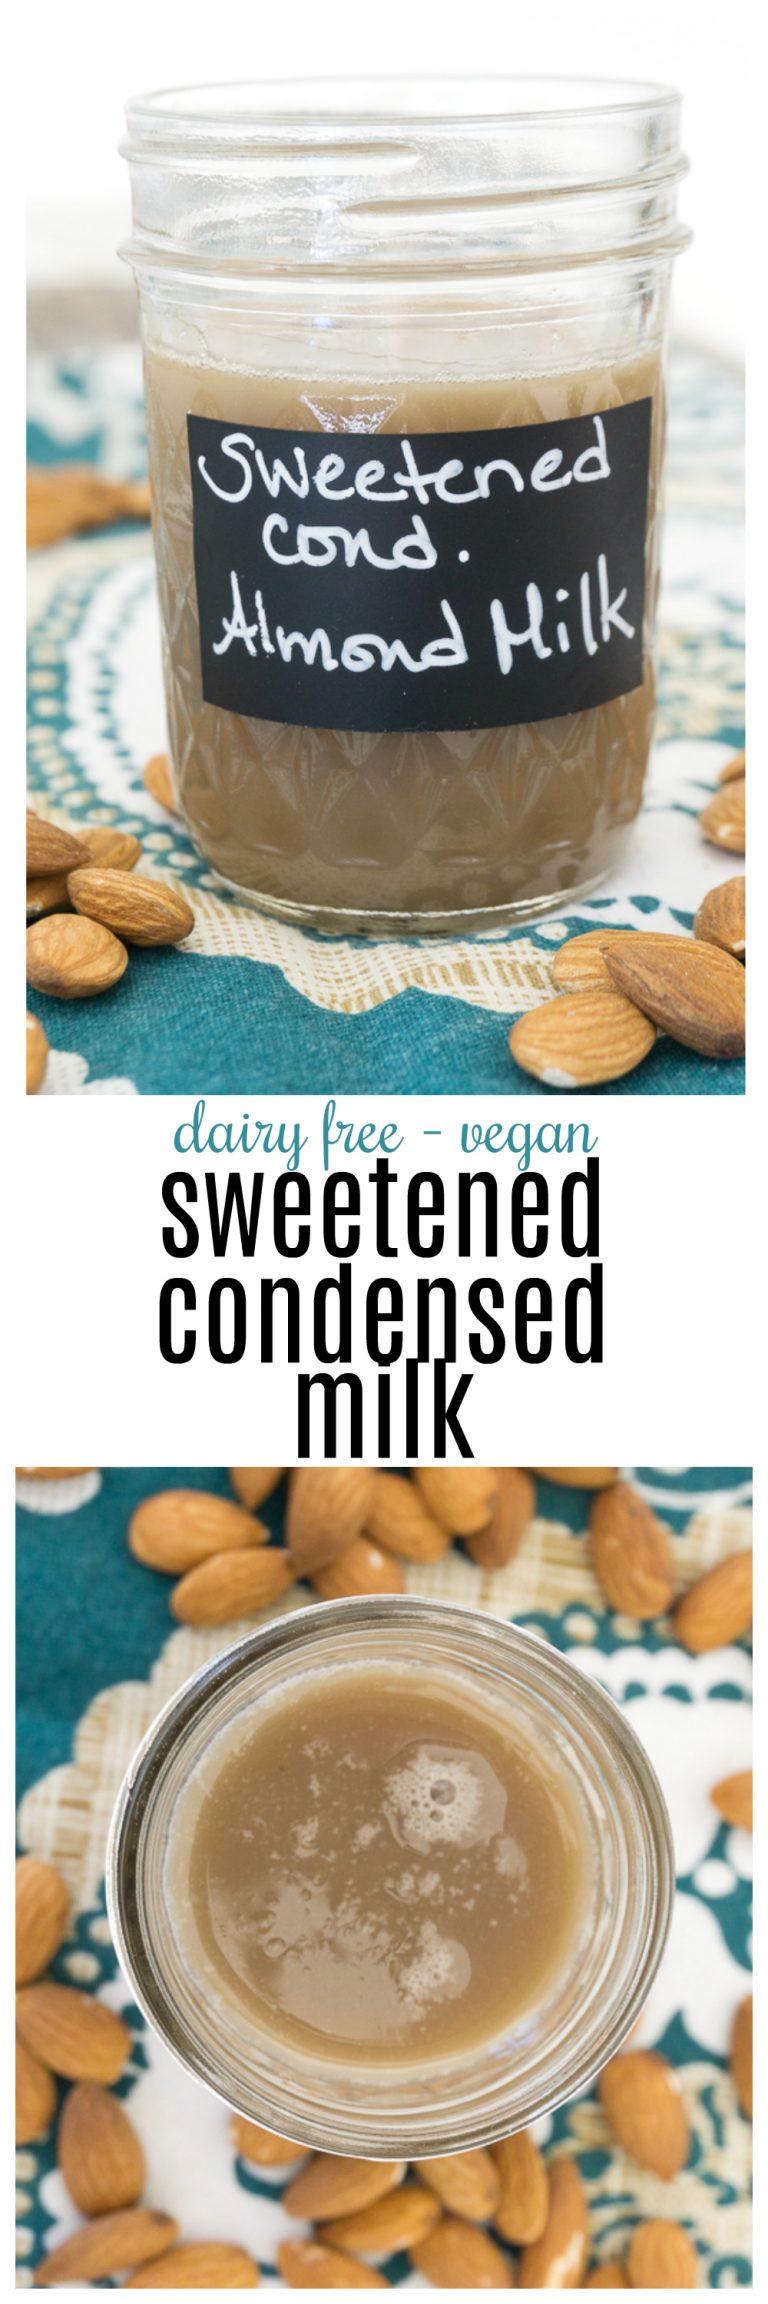 Sweetened Condensed Almond Milk Recipe Vegan Sweetened Condensed Milk Sweetened Condensed Milk Recipes Homemade Sweetened Condensed Milk